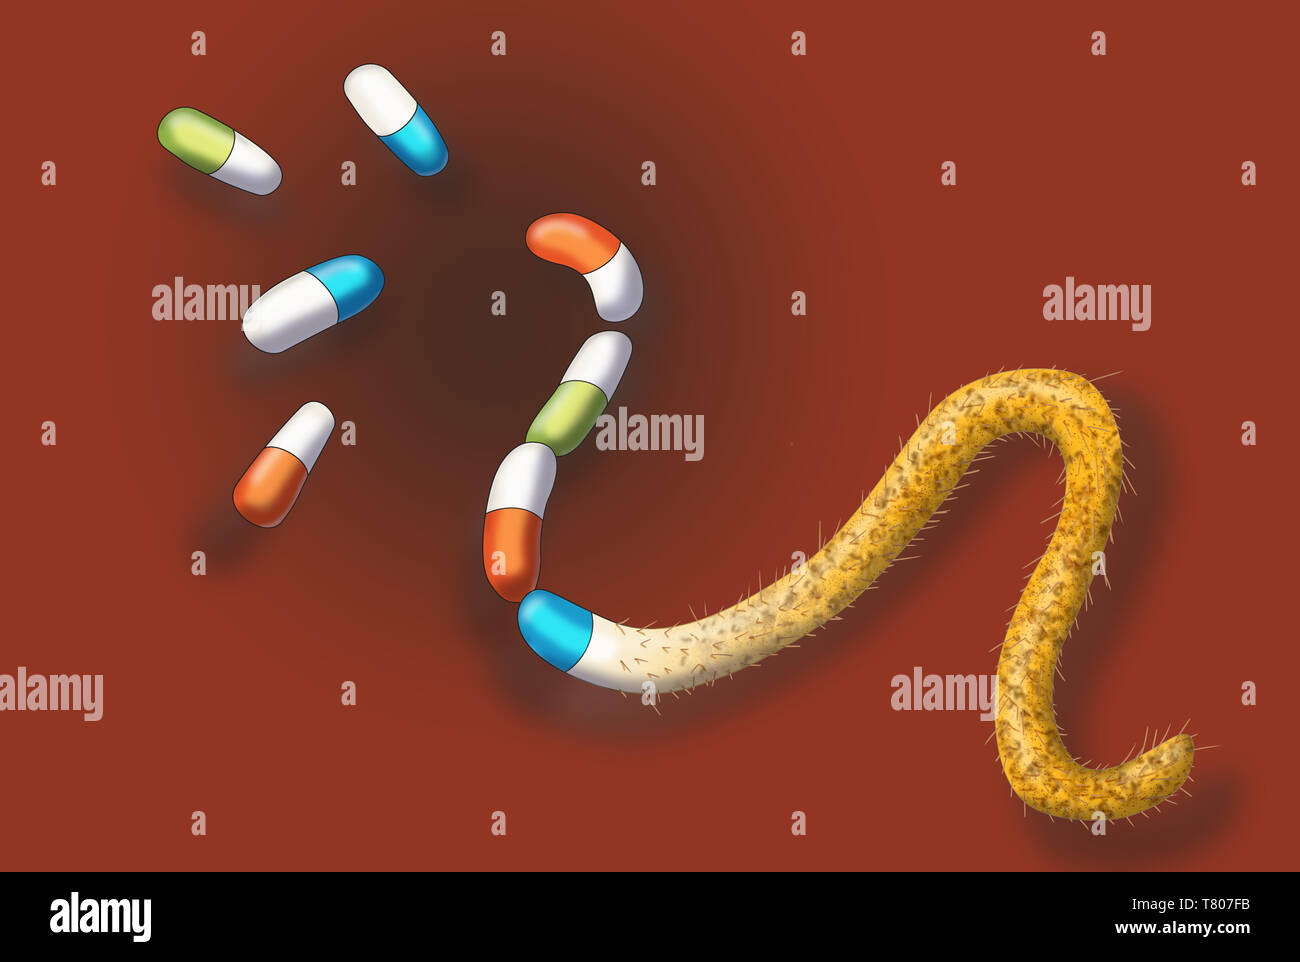 Antibiotic Resistant Bacteria, Illustration - Stock Image